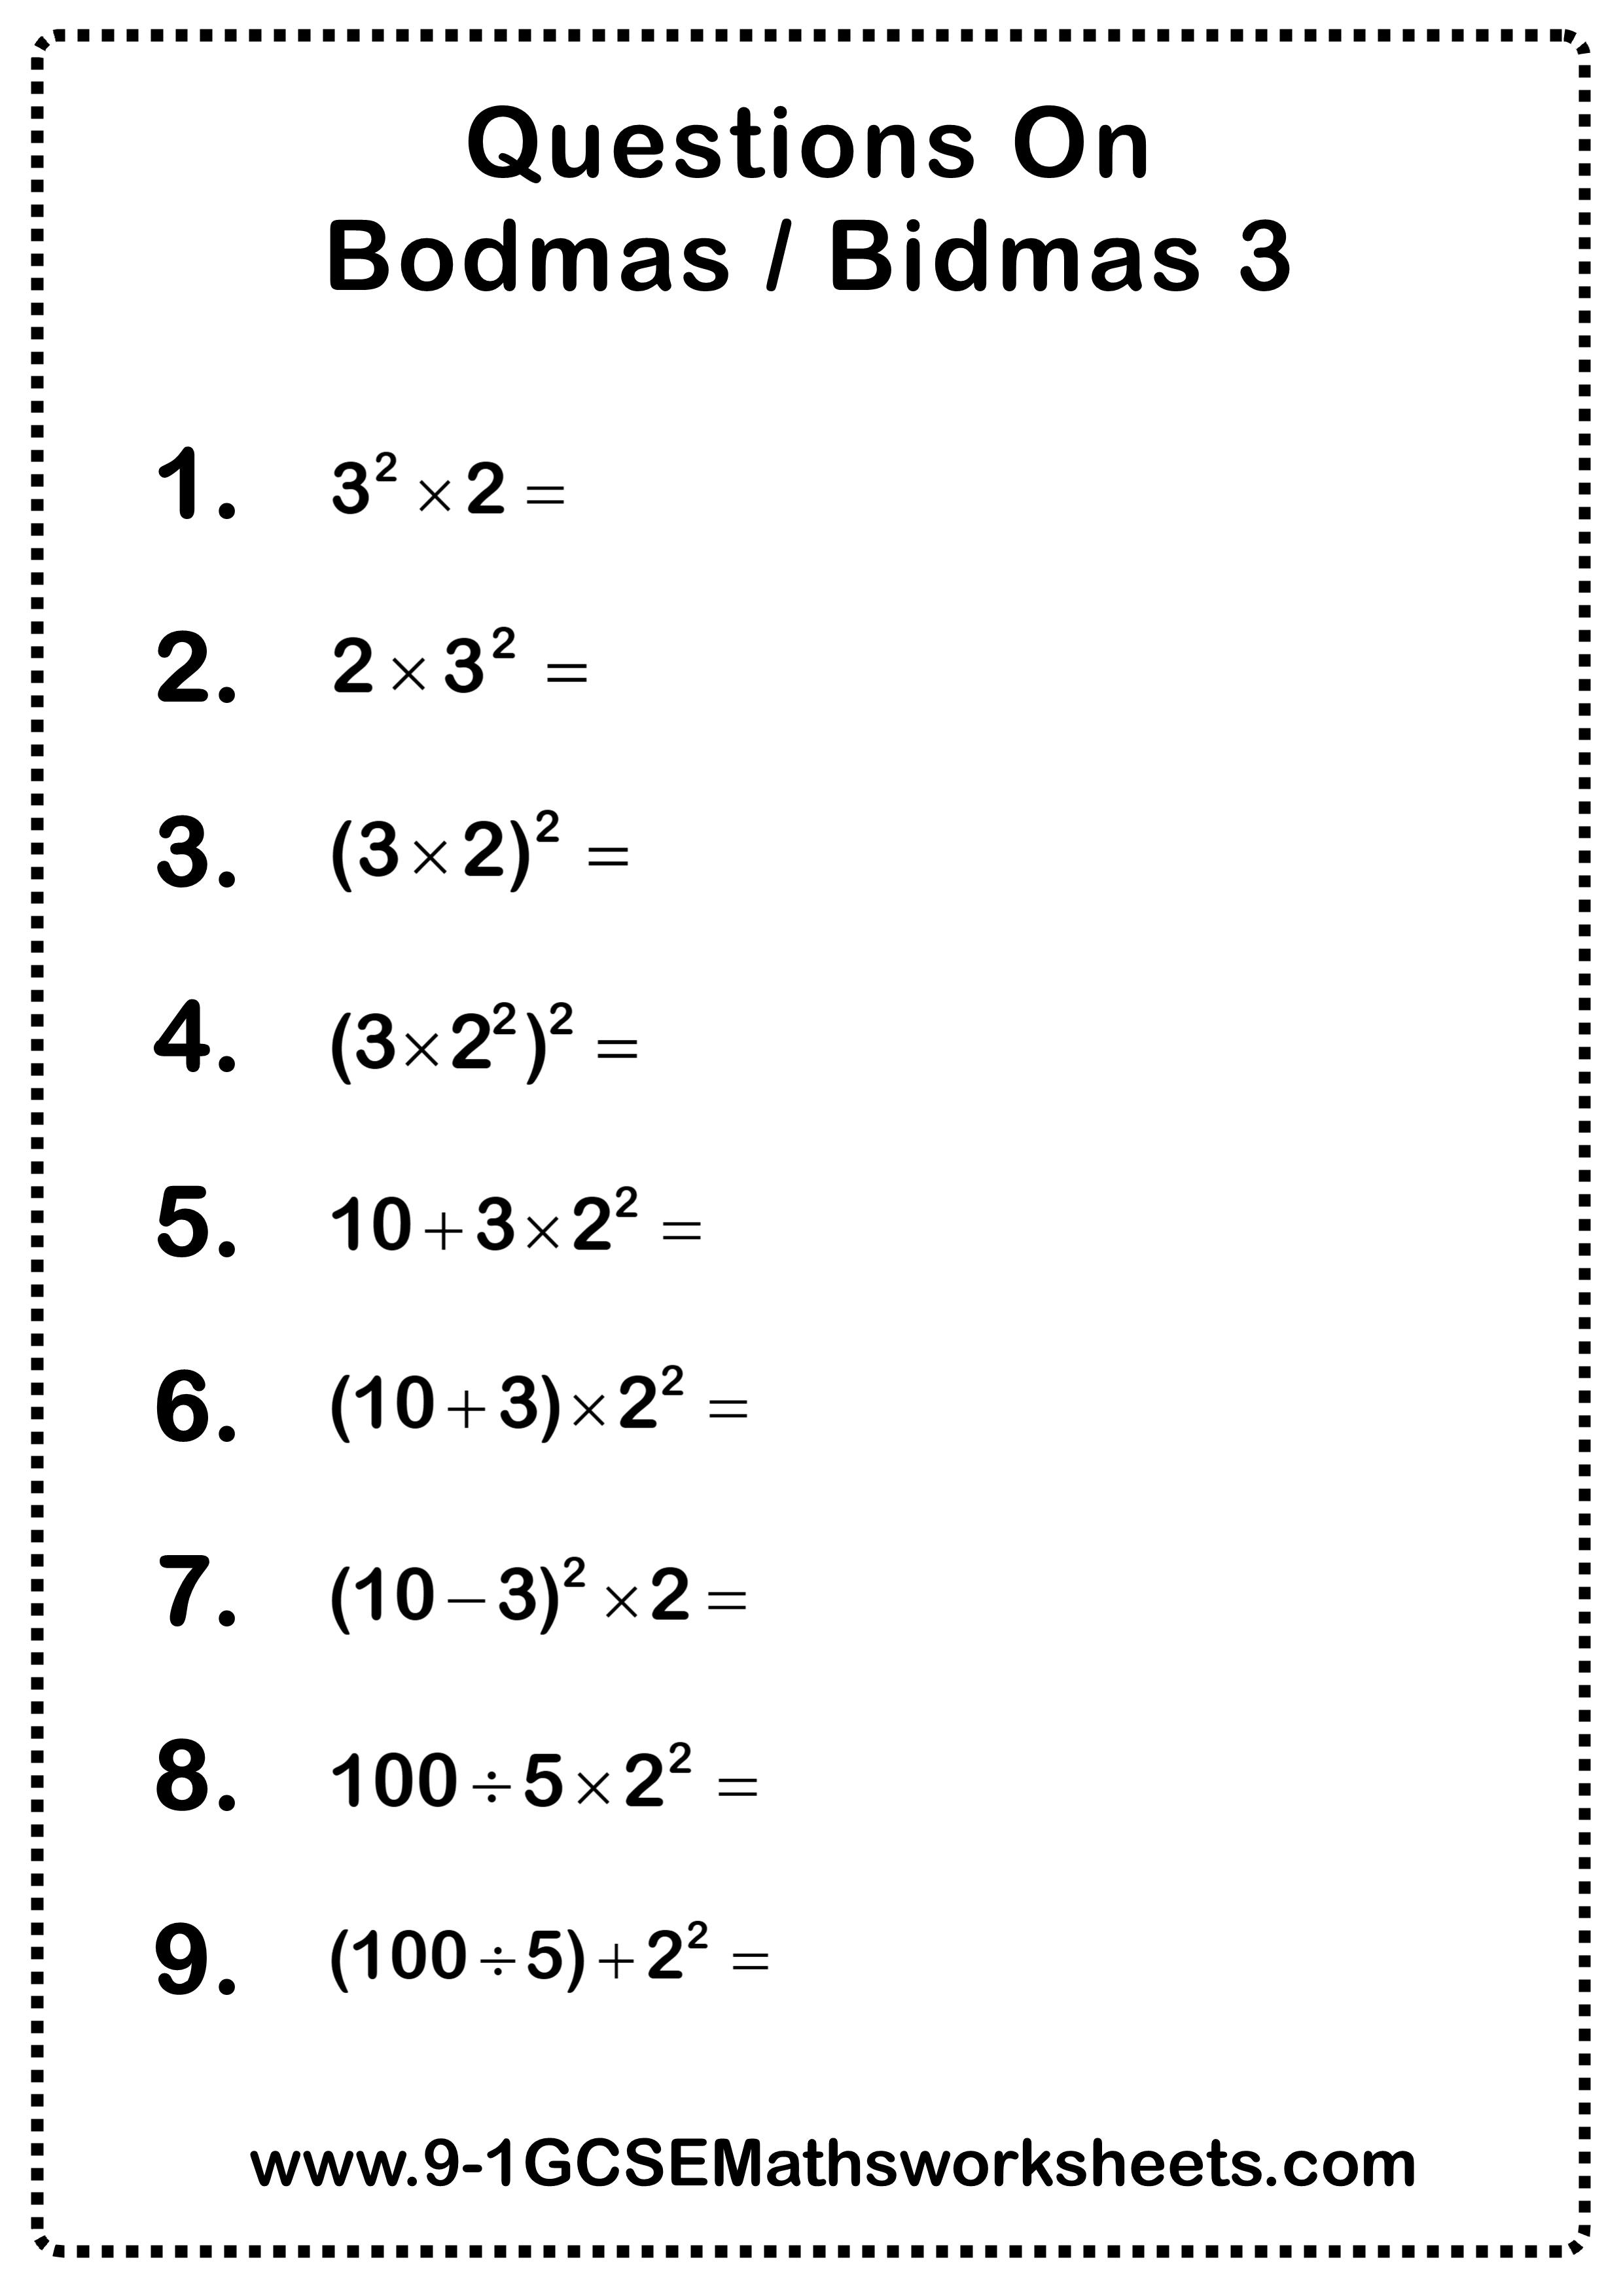 medium resolution of Bodmas Questions 3   Bodmas